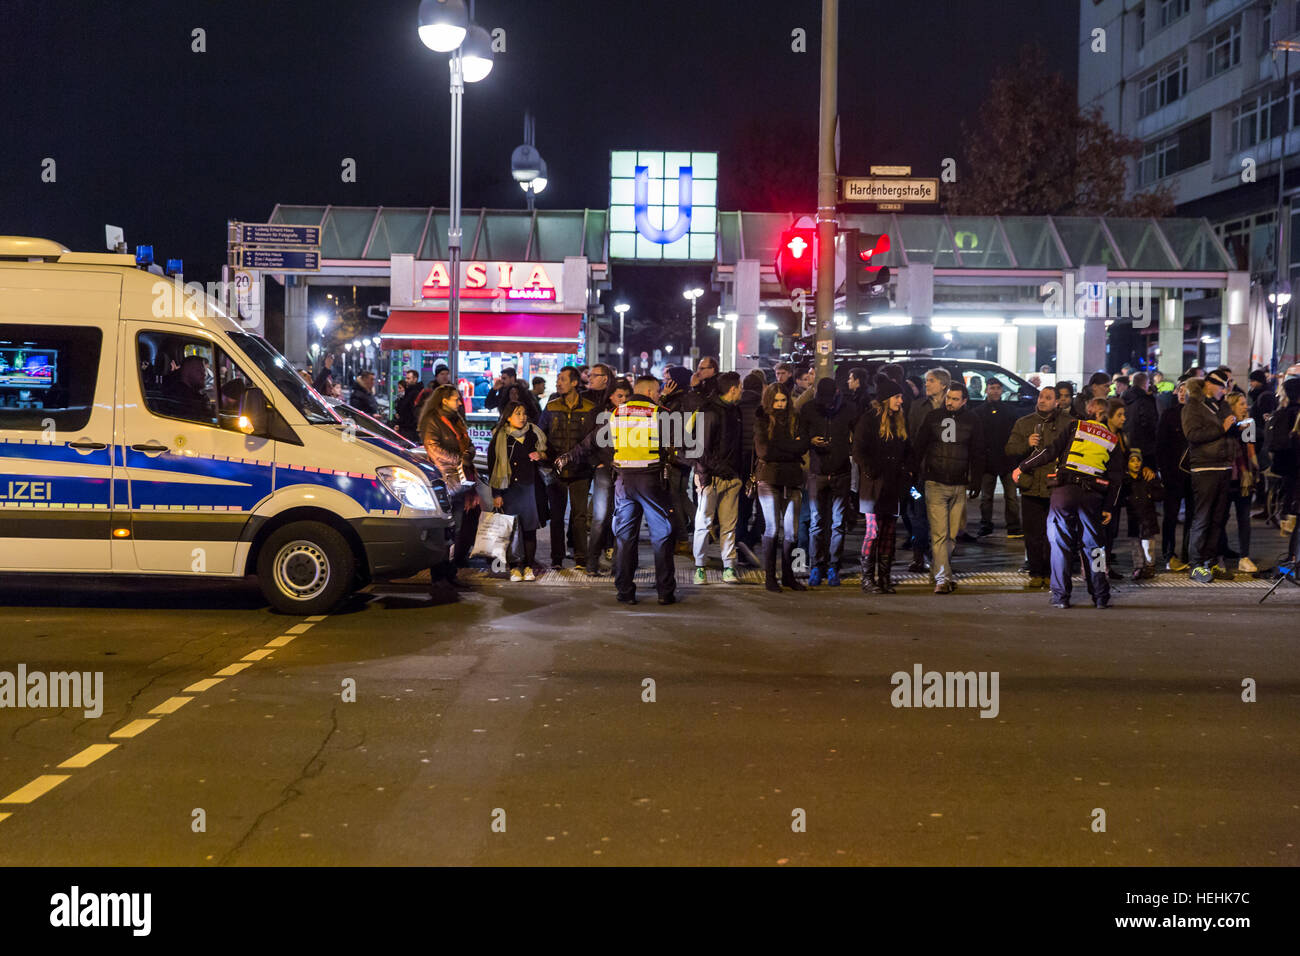 Berlin, Germany, police operation at the Christmas market on Breitscheidplatz - Stock Image